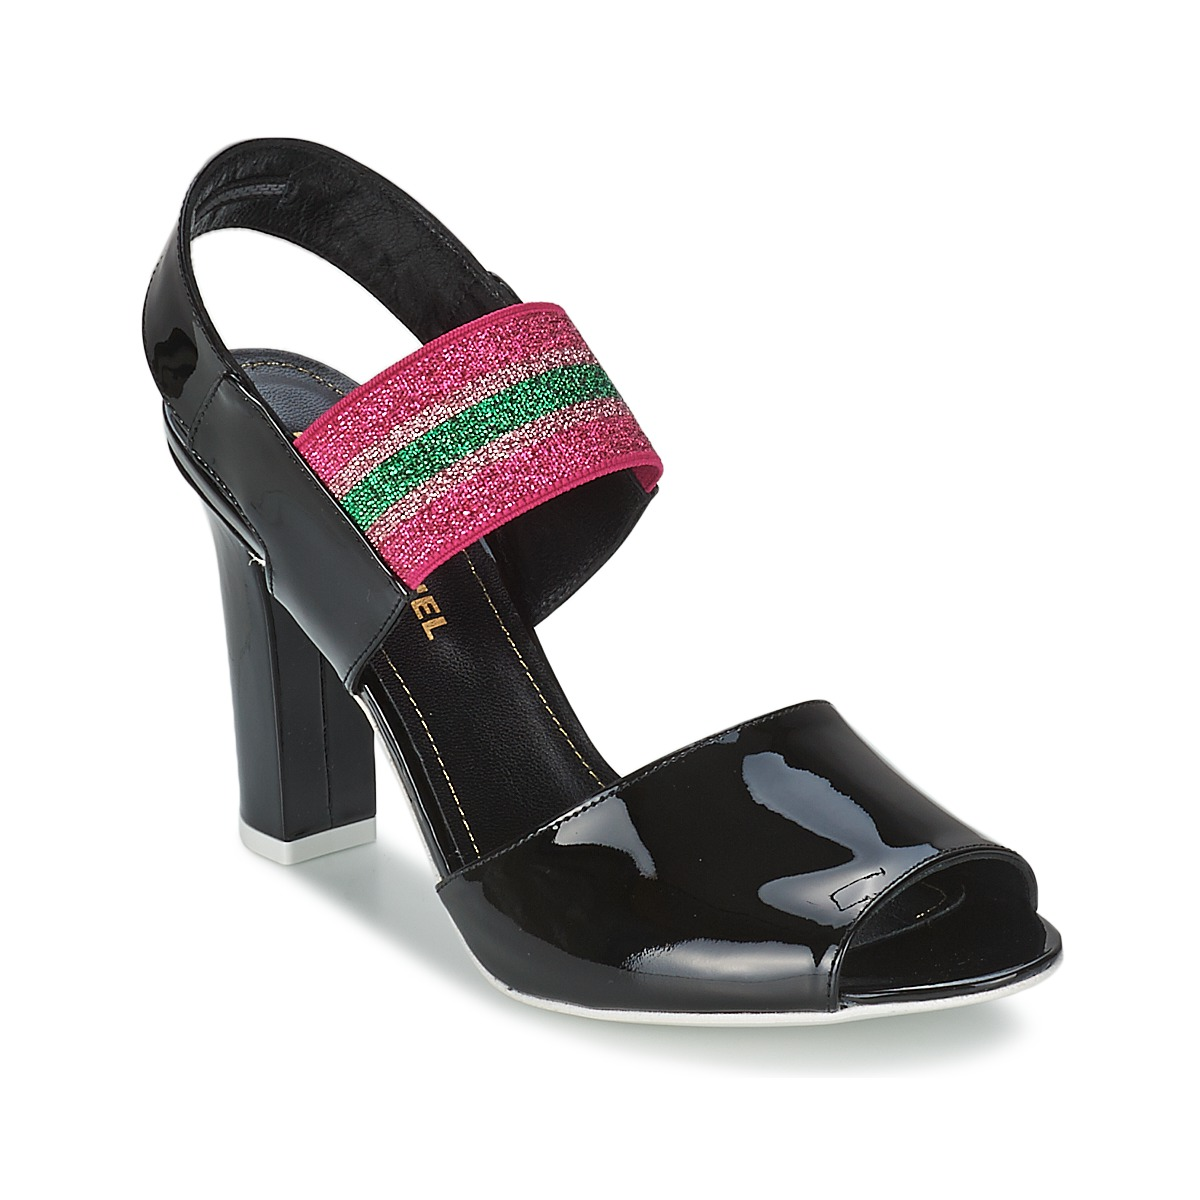 Sandale Sonia Rykiel 683902 Noir / Rose